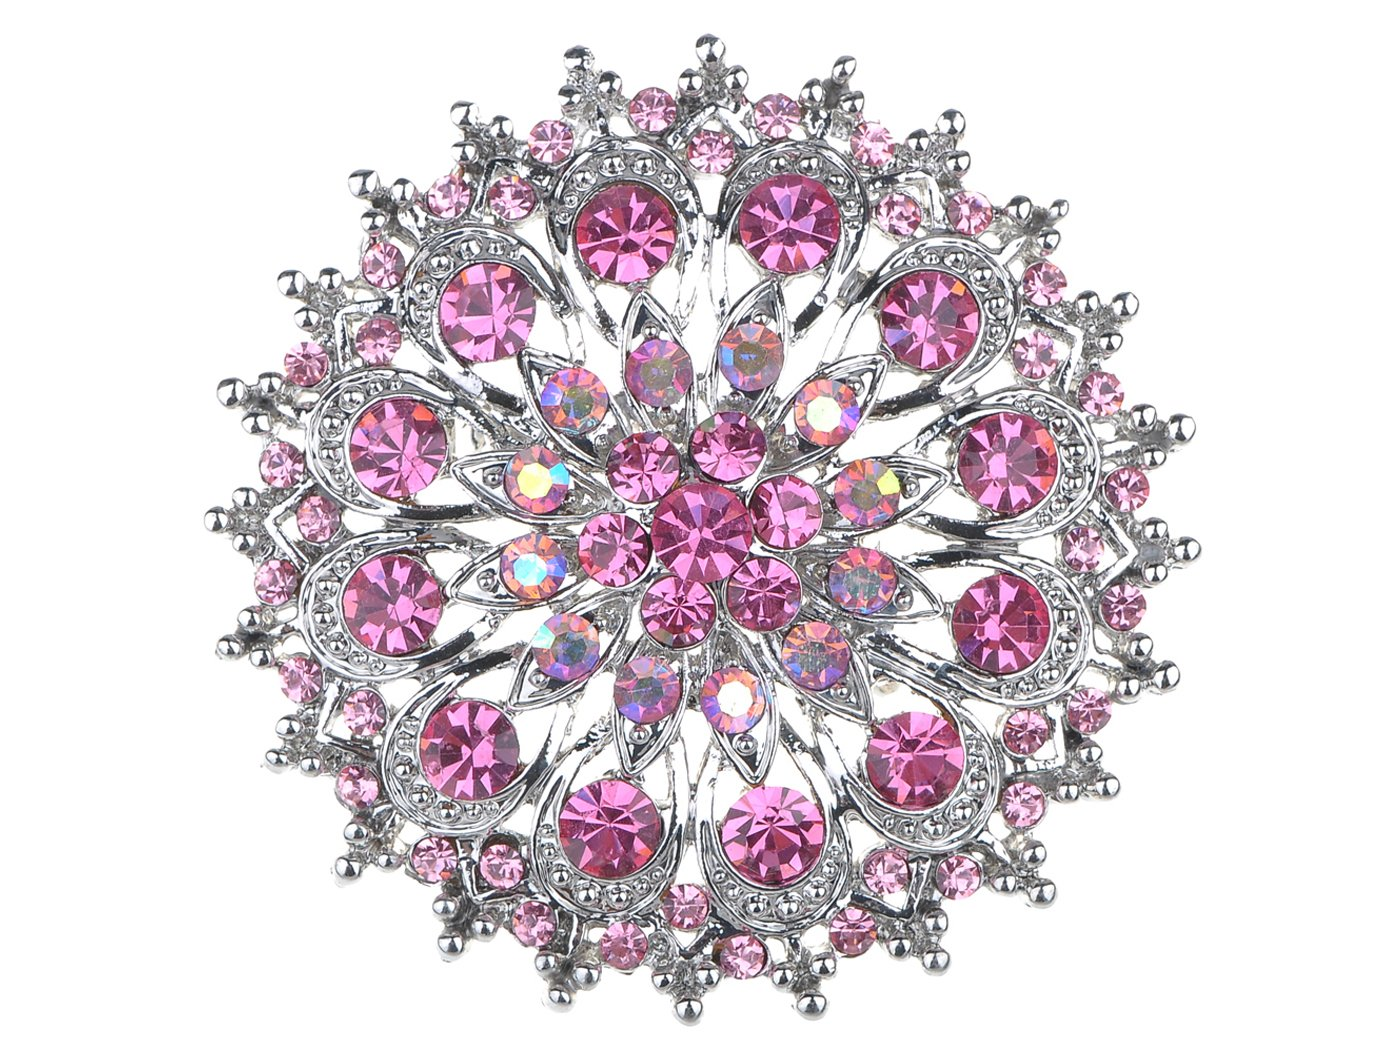 Alilang Pink Rose Rhinestone Crystal Royal Princess Crest Floral Wreath Bouquet Wedding Brooch Pin